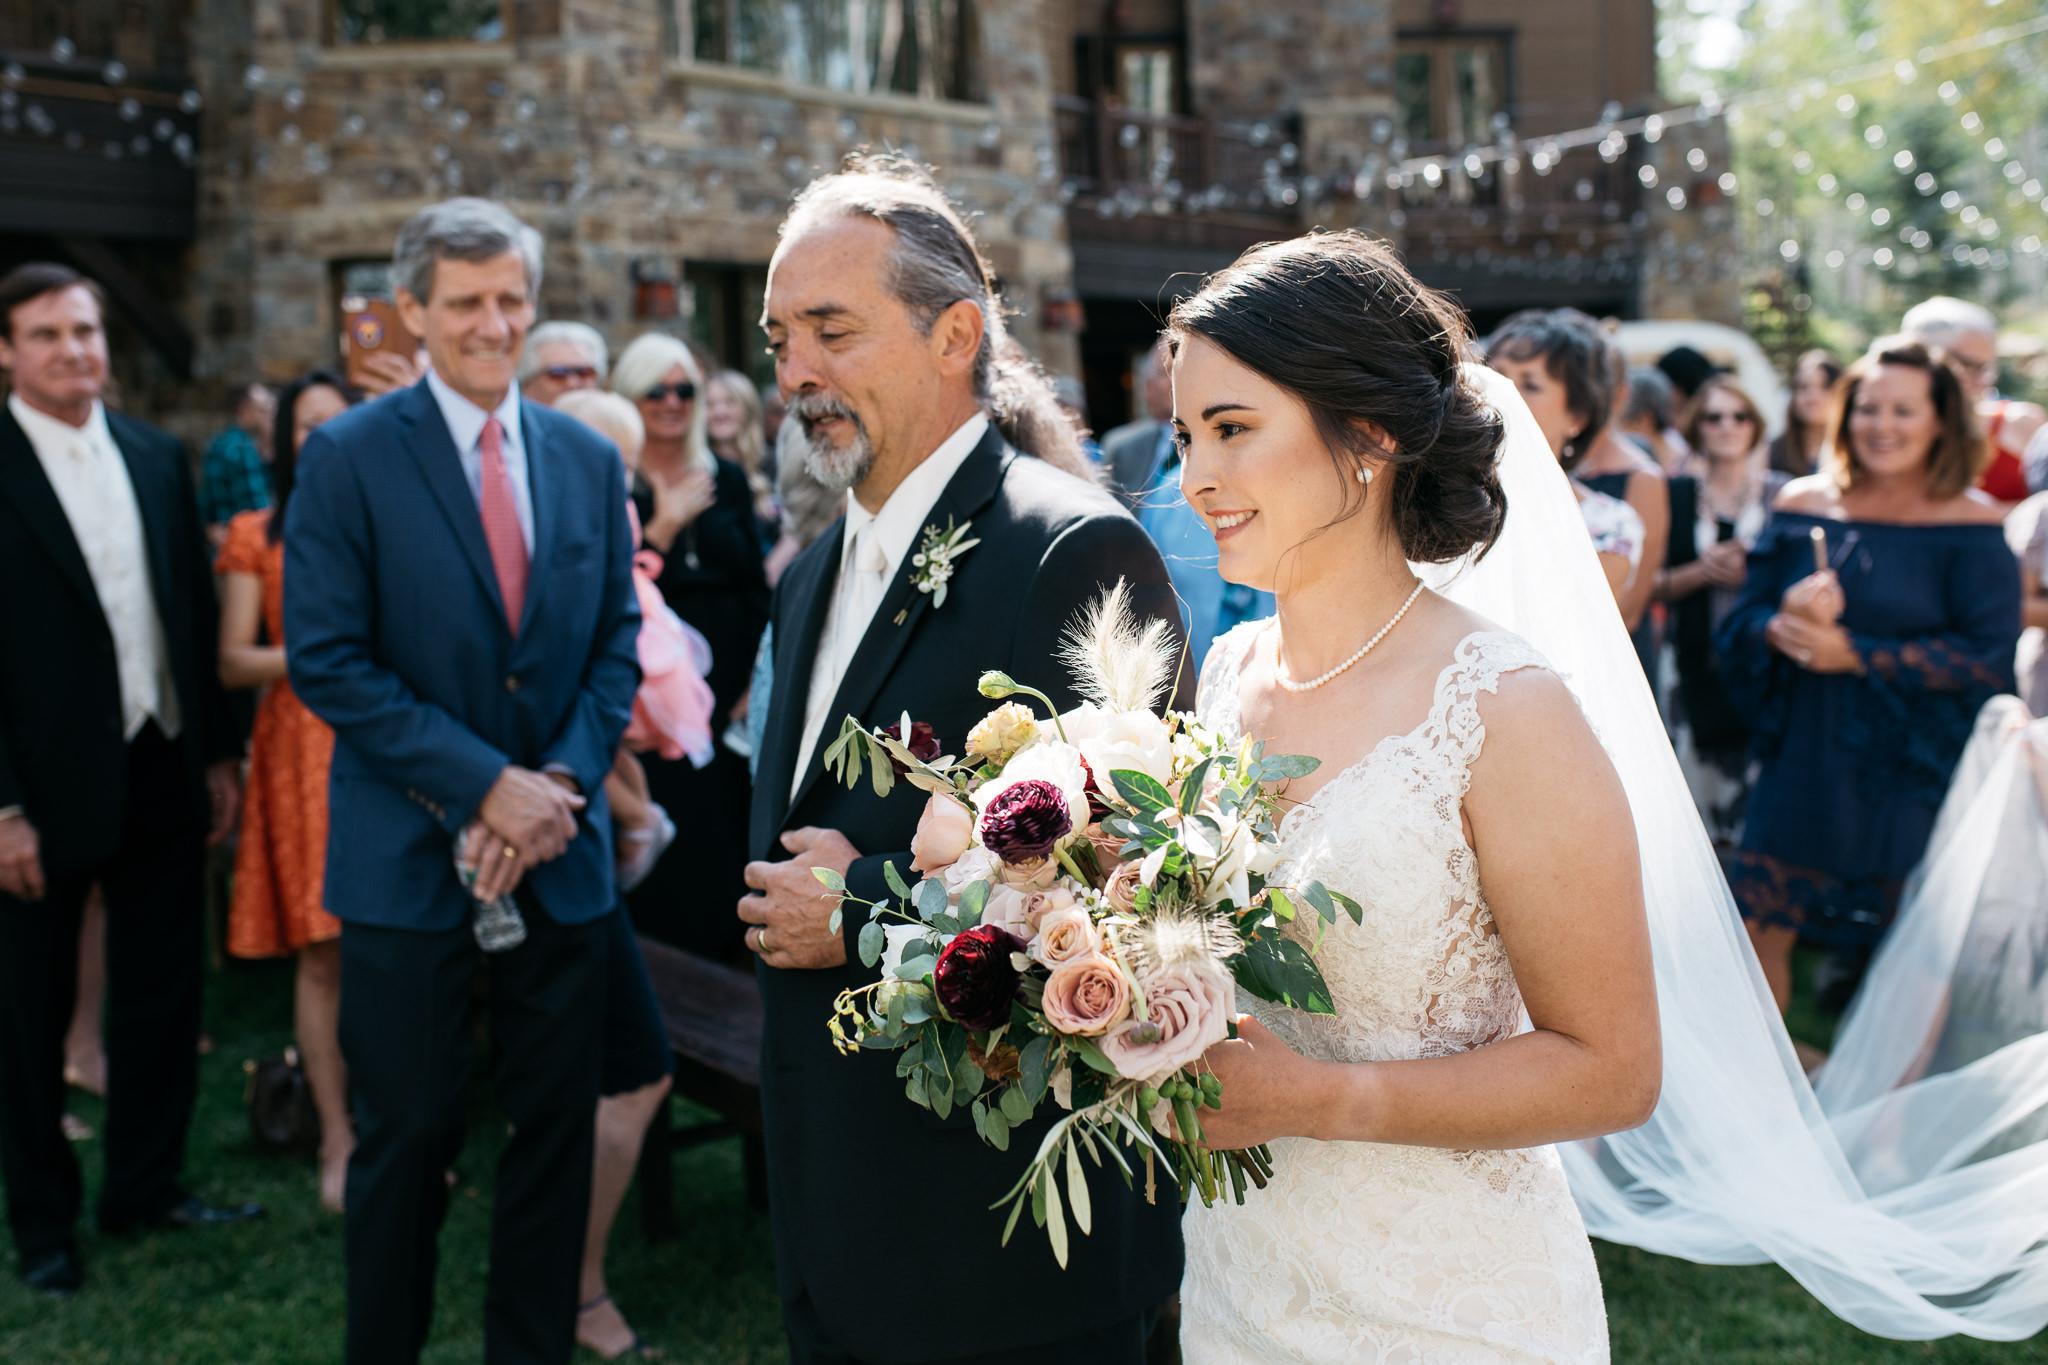 258_ONL_Kat_Nick_Wedding_Trevor_Hooper_Photo.jpg